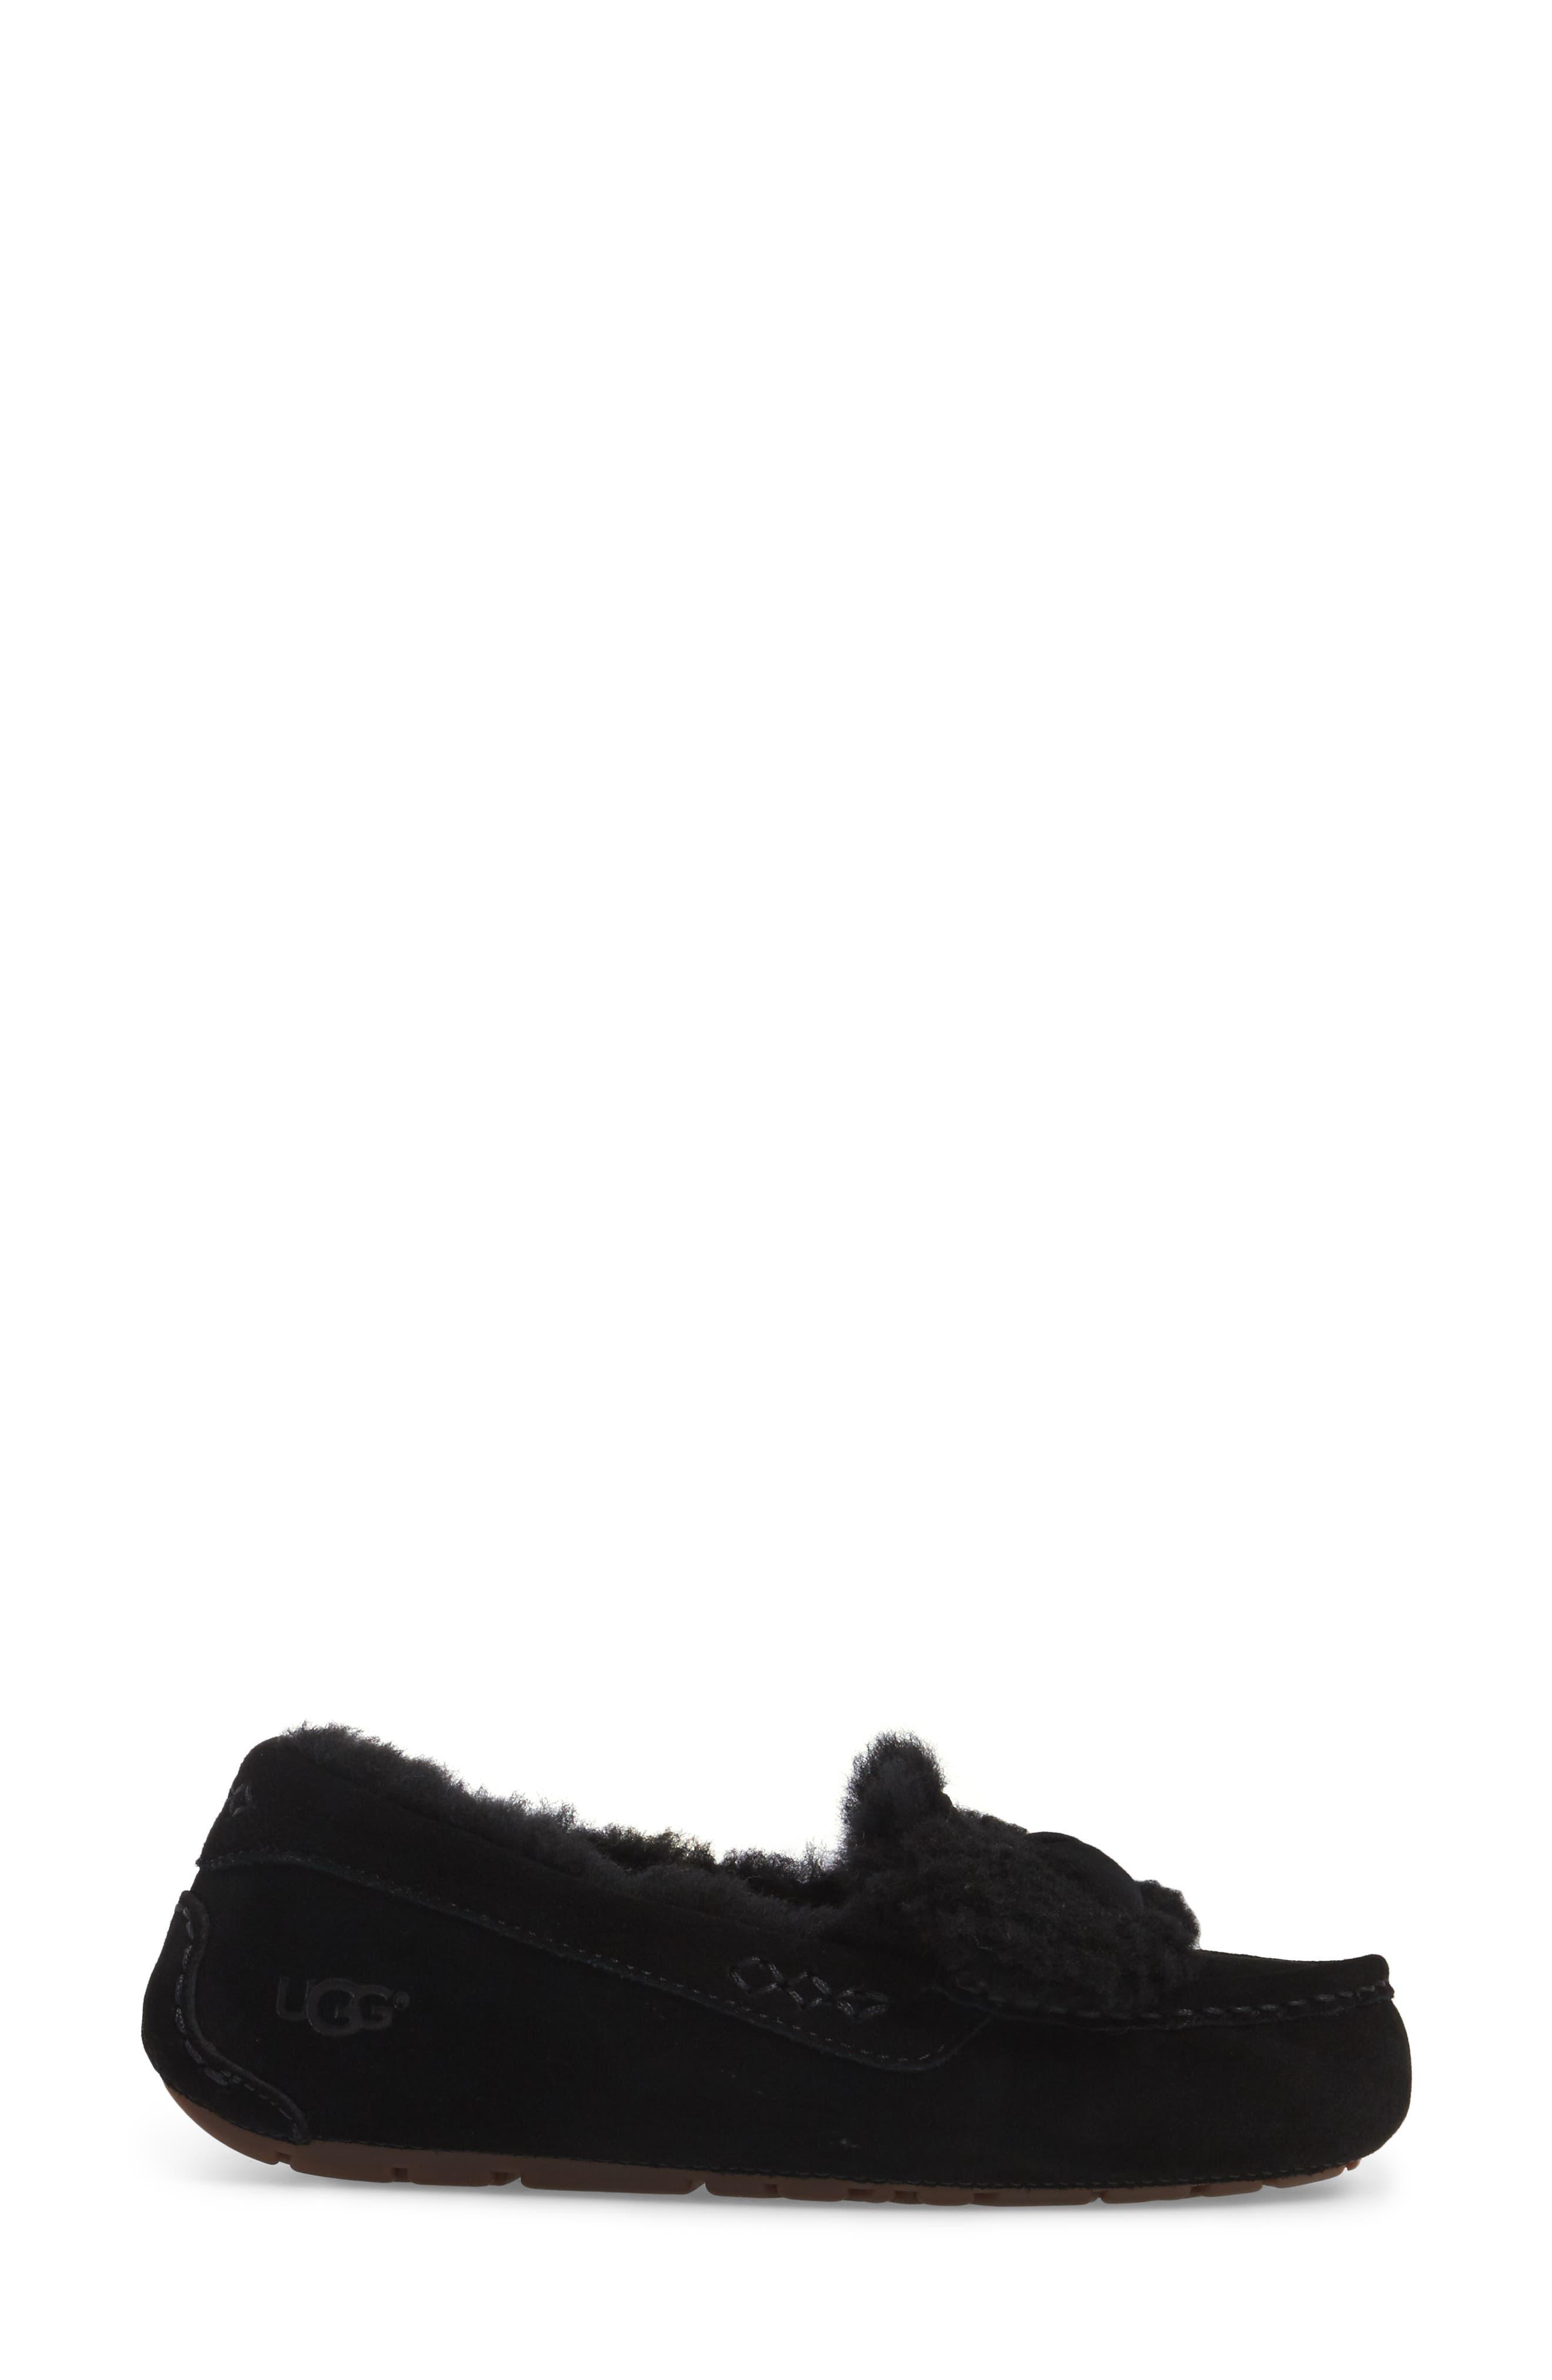 Alternate Image 3  - UGG® Ansley Bow Slipper